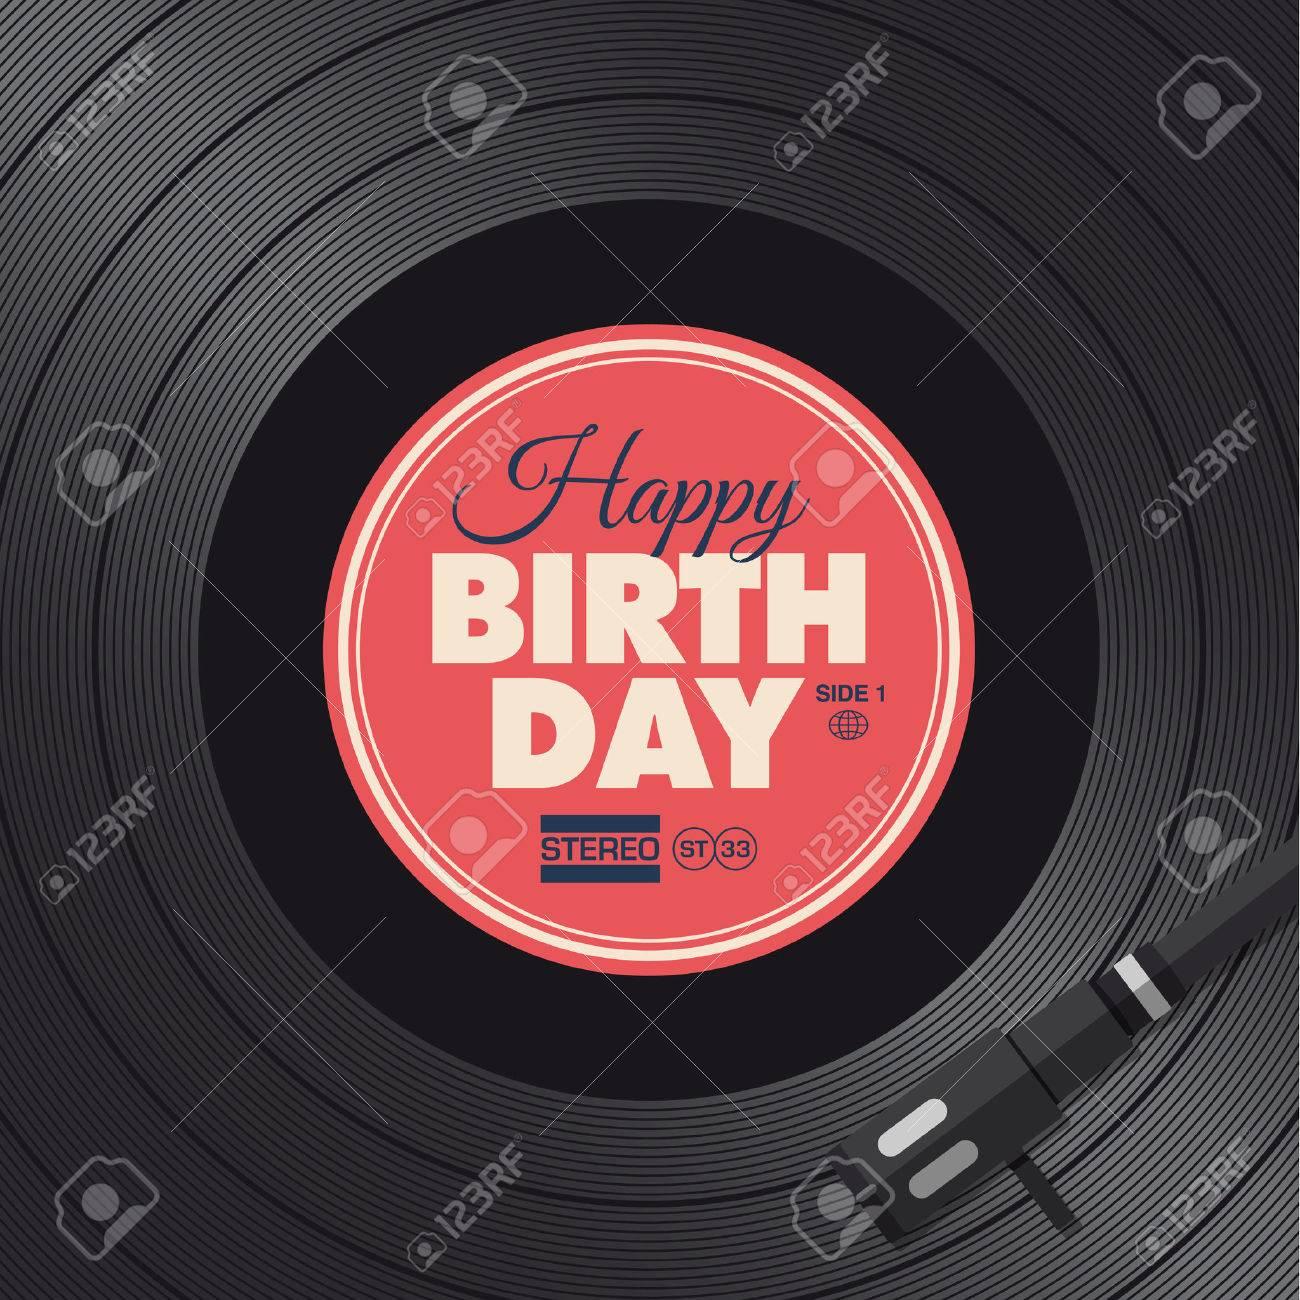 Happy birthday card Vinyl illustration background, vector design..